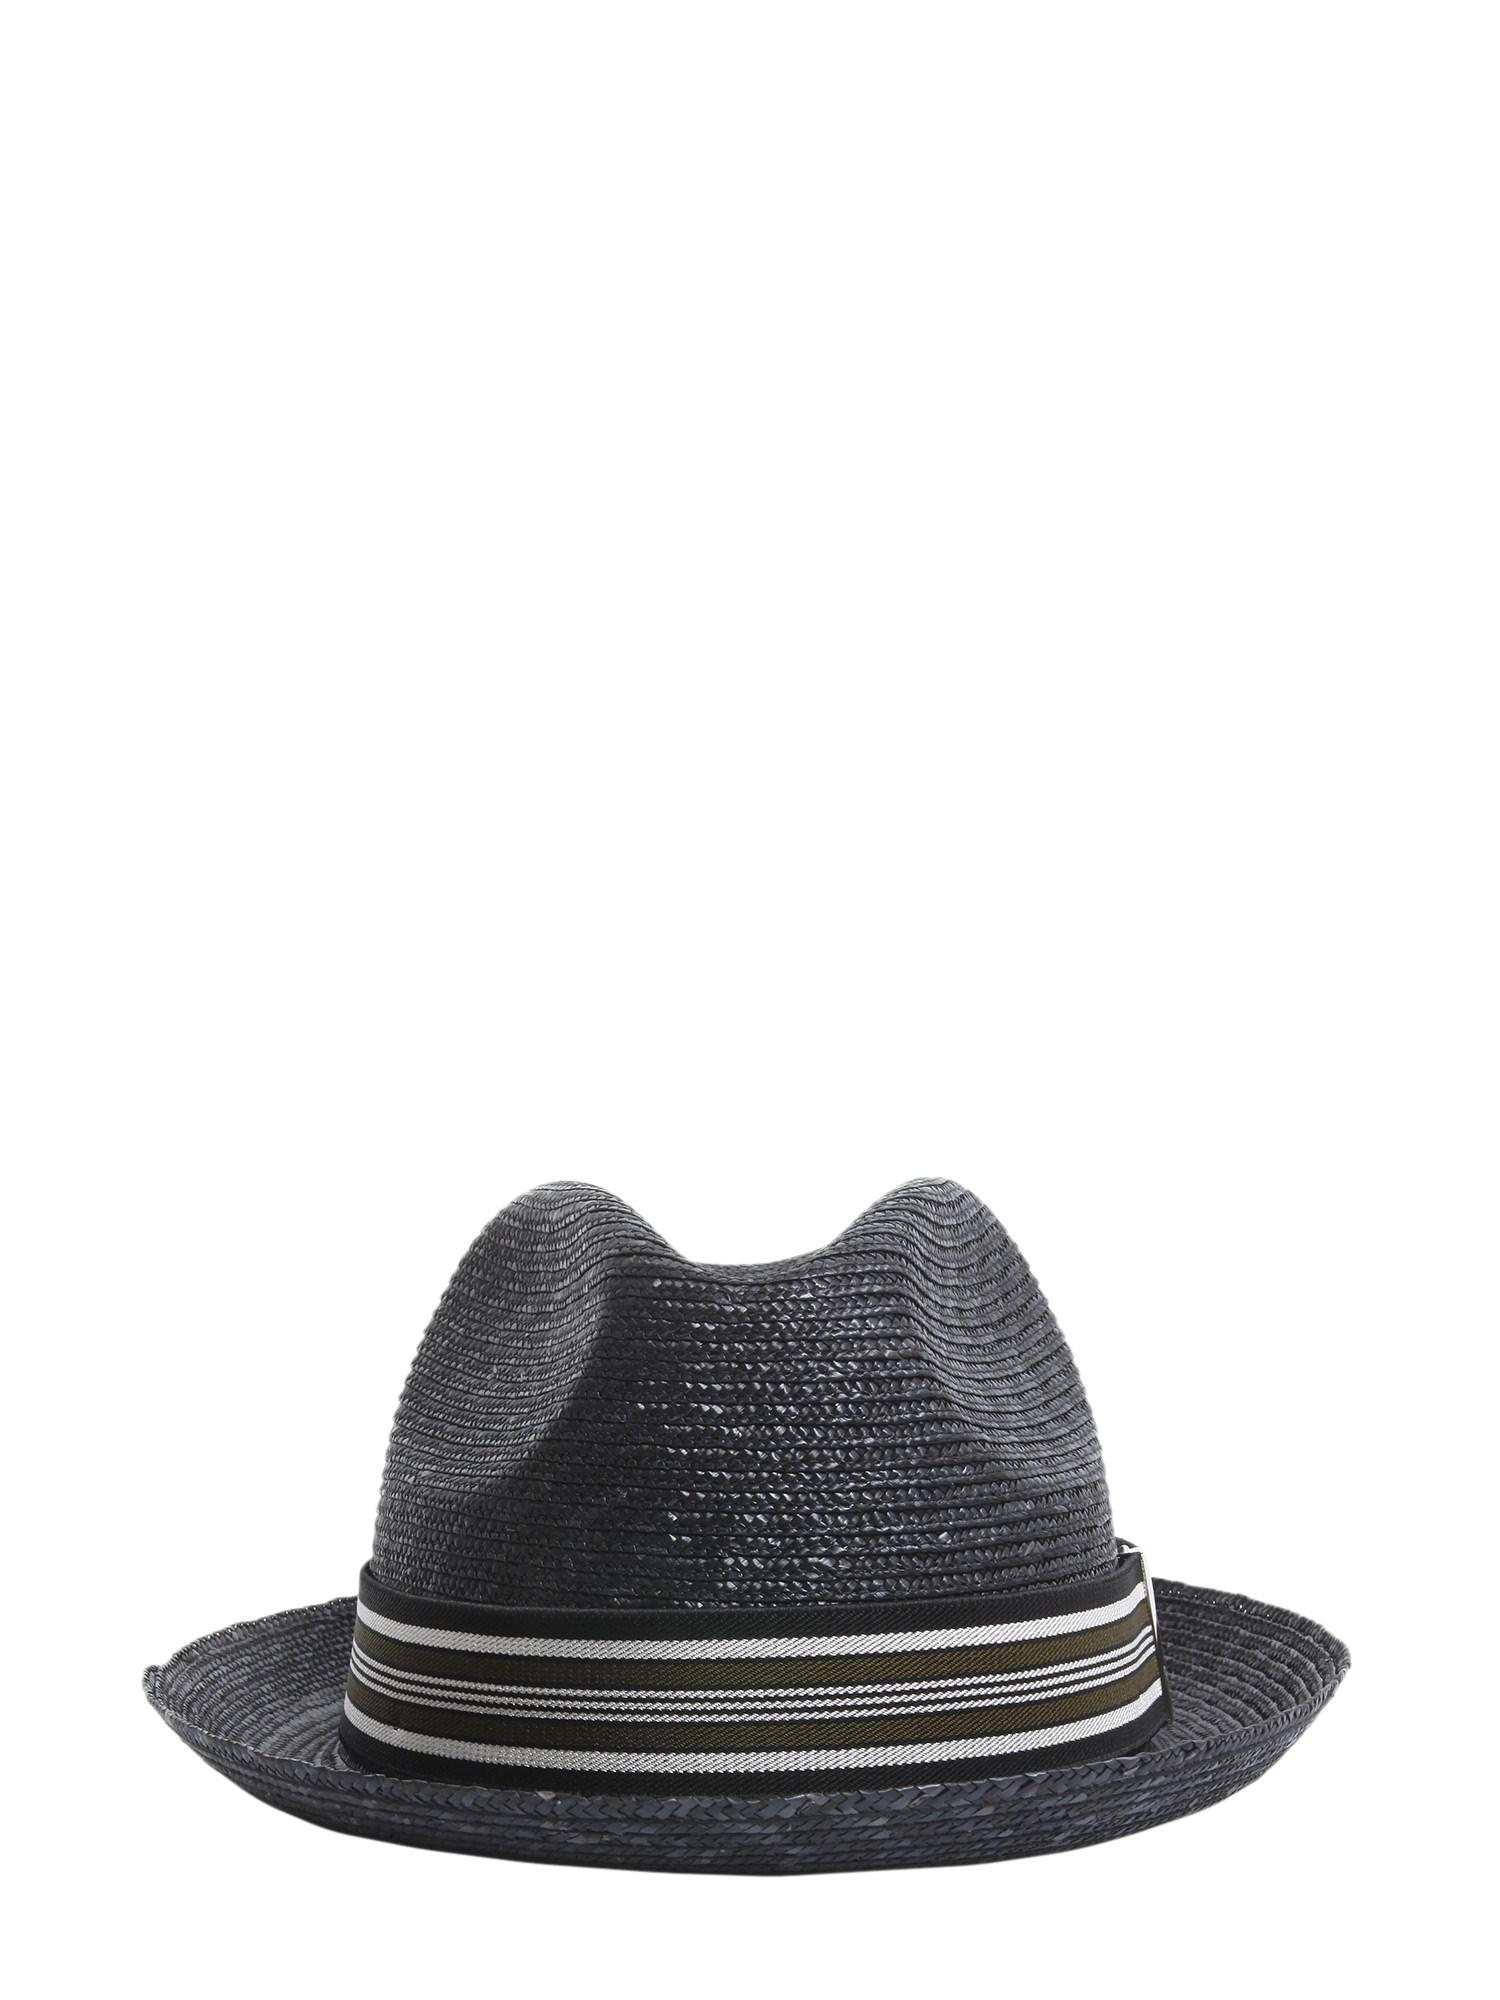 Lyst - Borsalino Suspender Straw Cap in Black for Men 9b2231c34f82